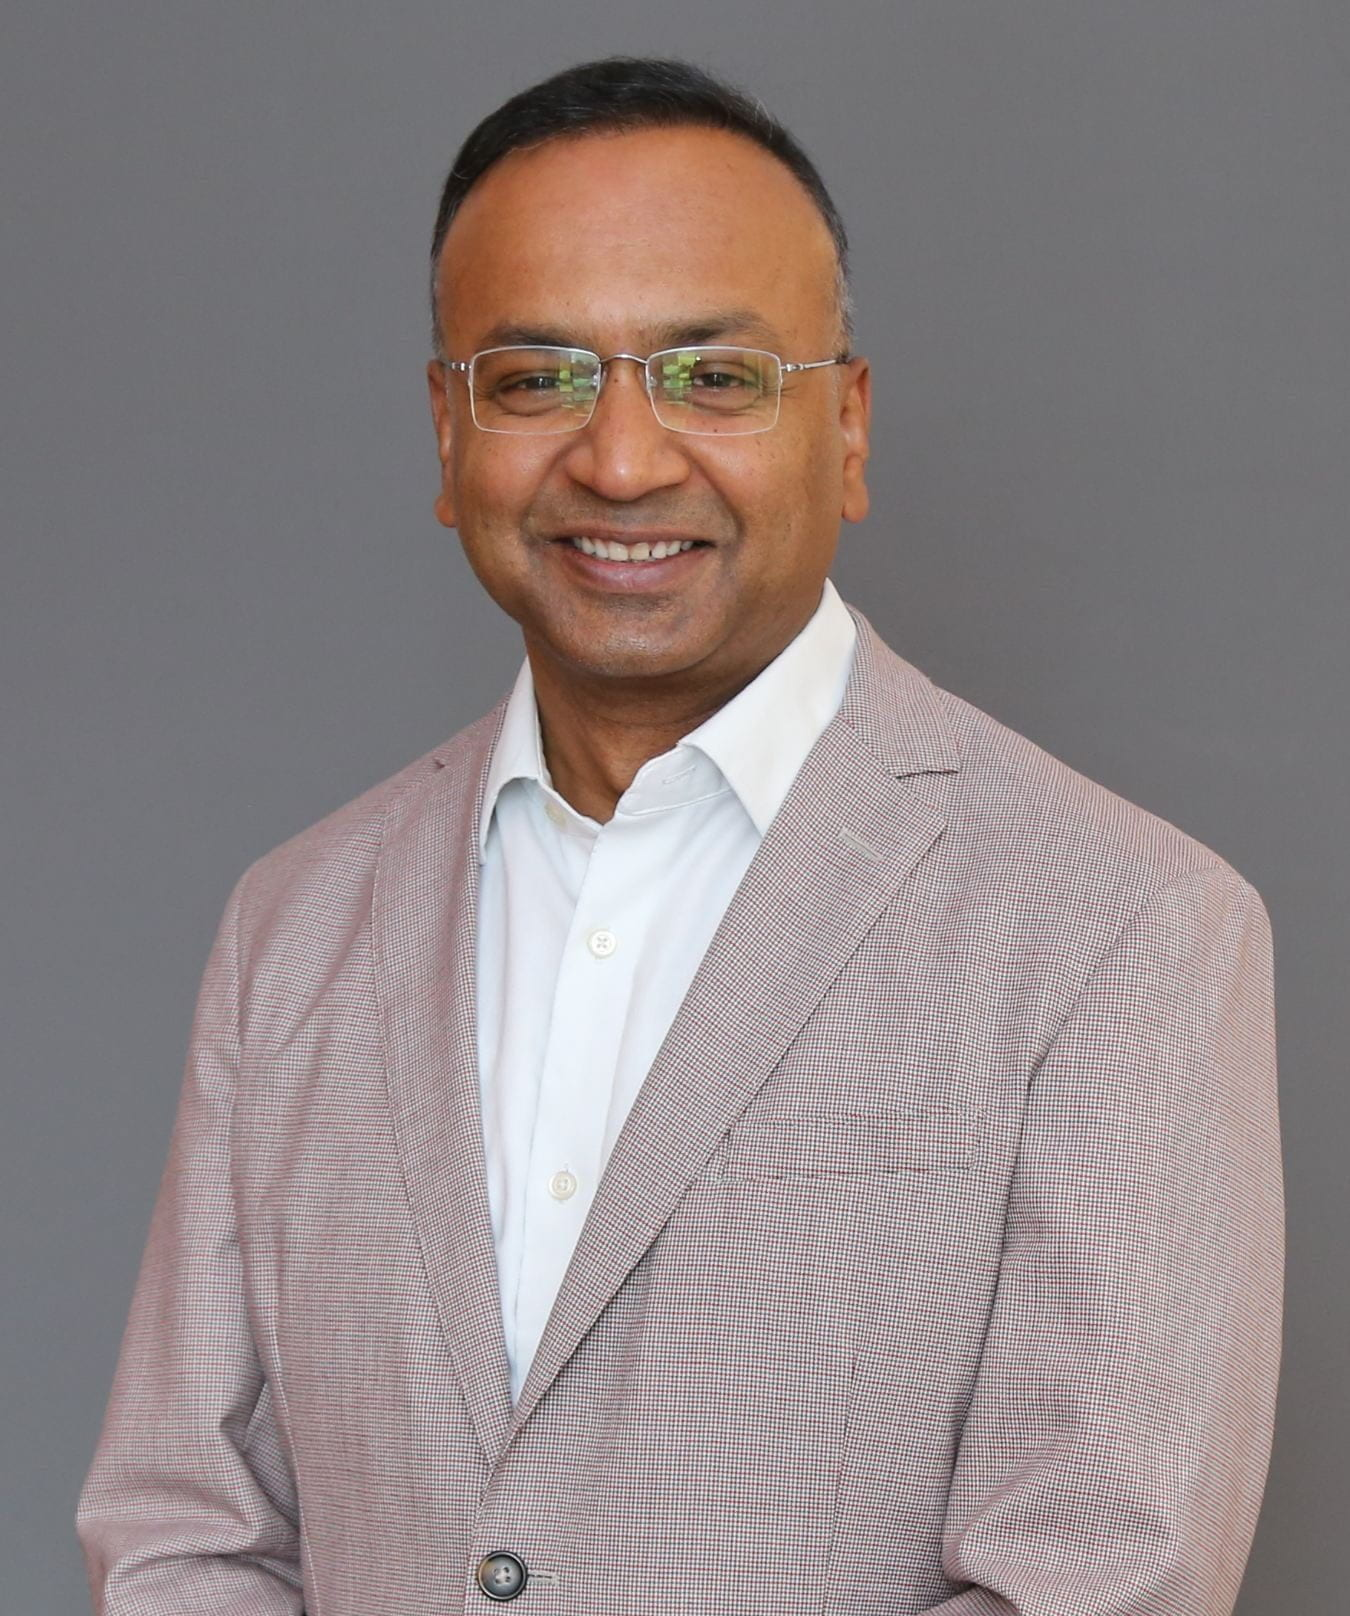 Dr. Srivastava portrait photo.